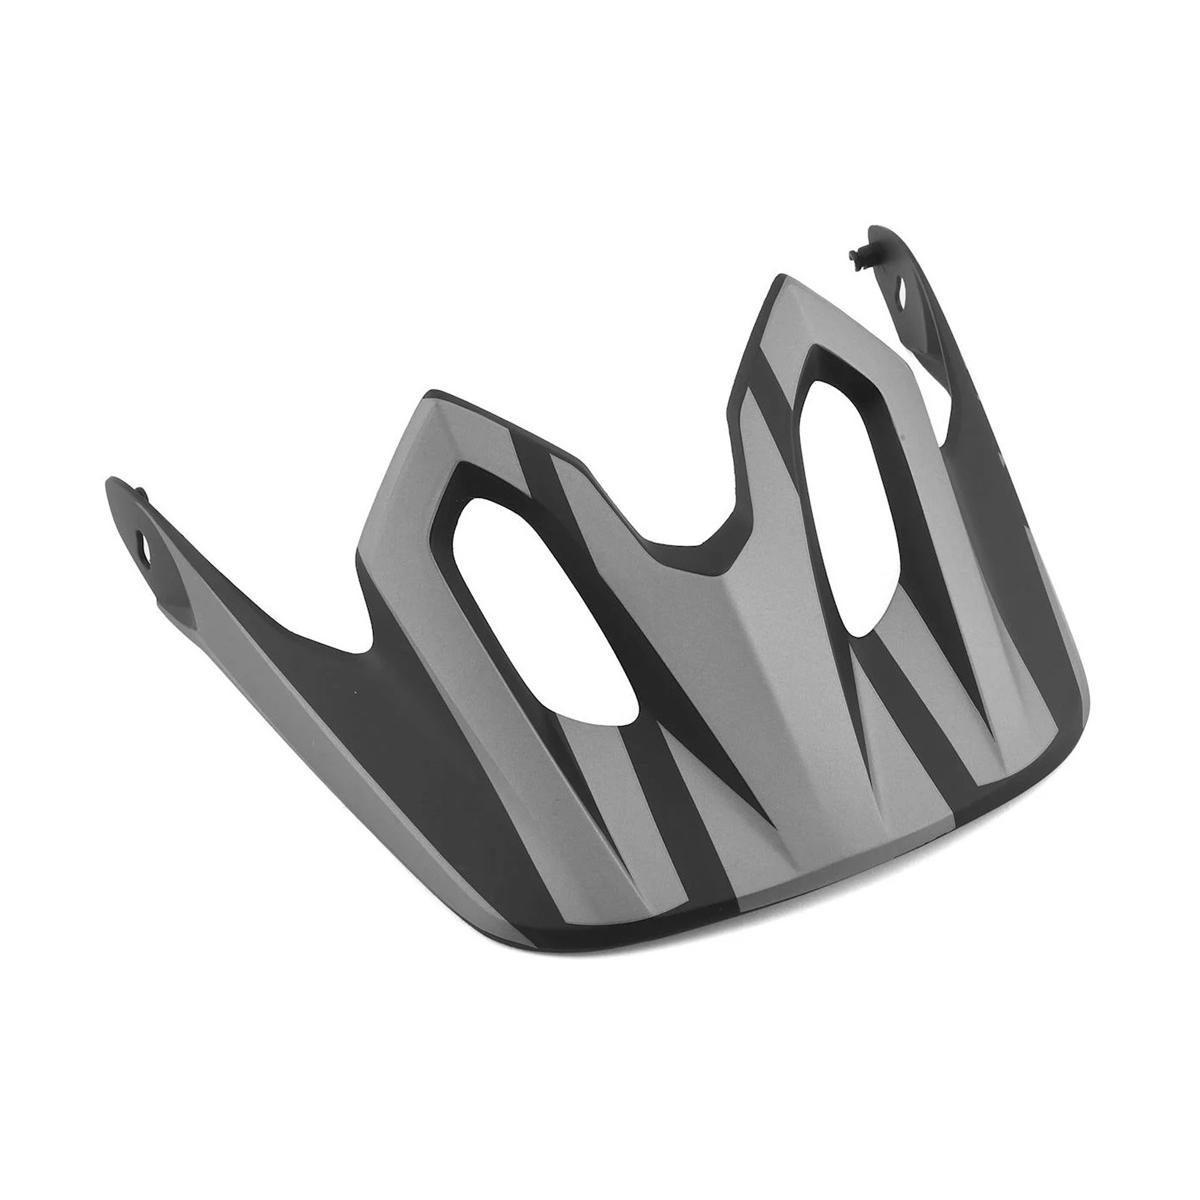 Helmet Visor Super DH Mips Black Size M (55/59cm)